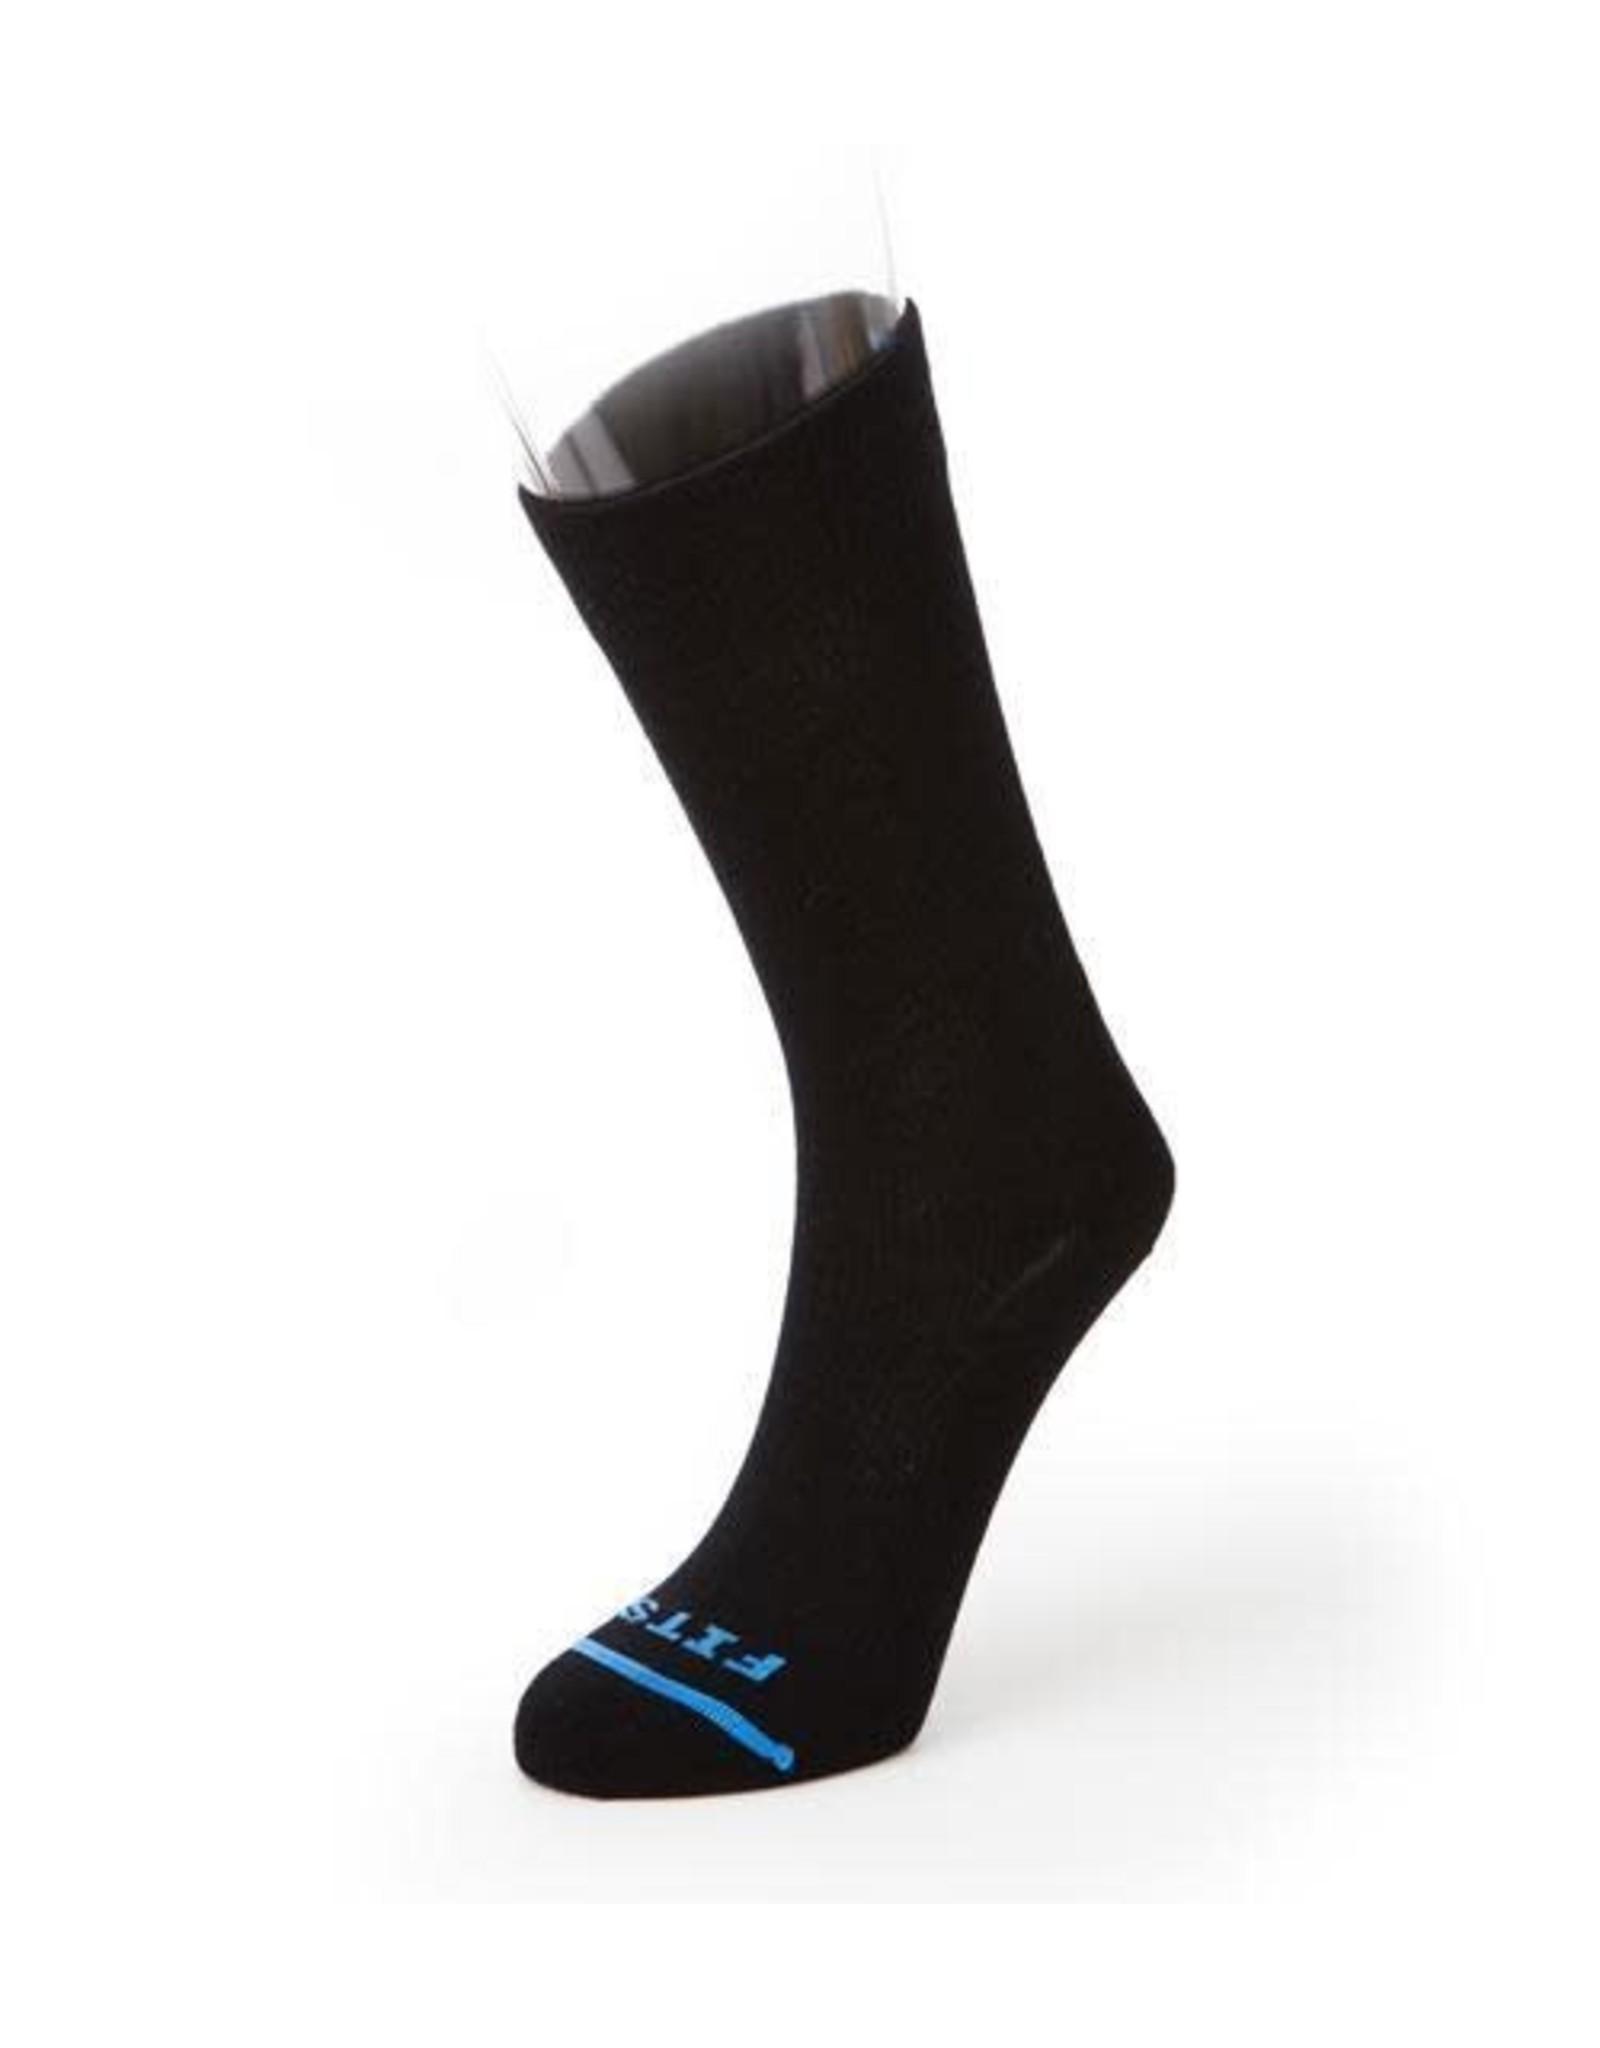 FITS FITS Light Hiker Crew Sock